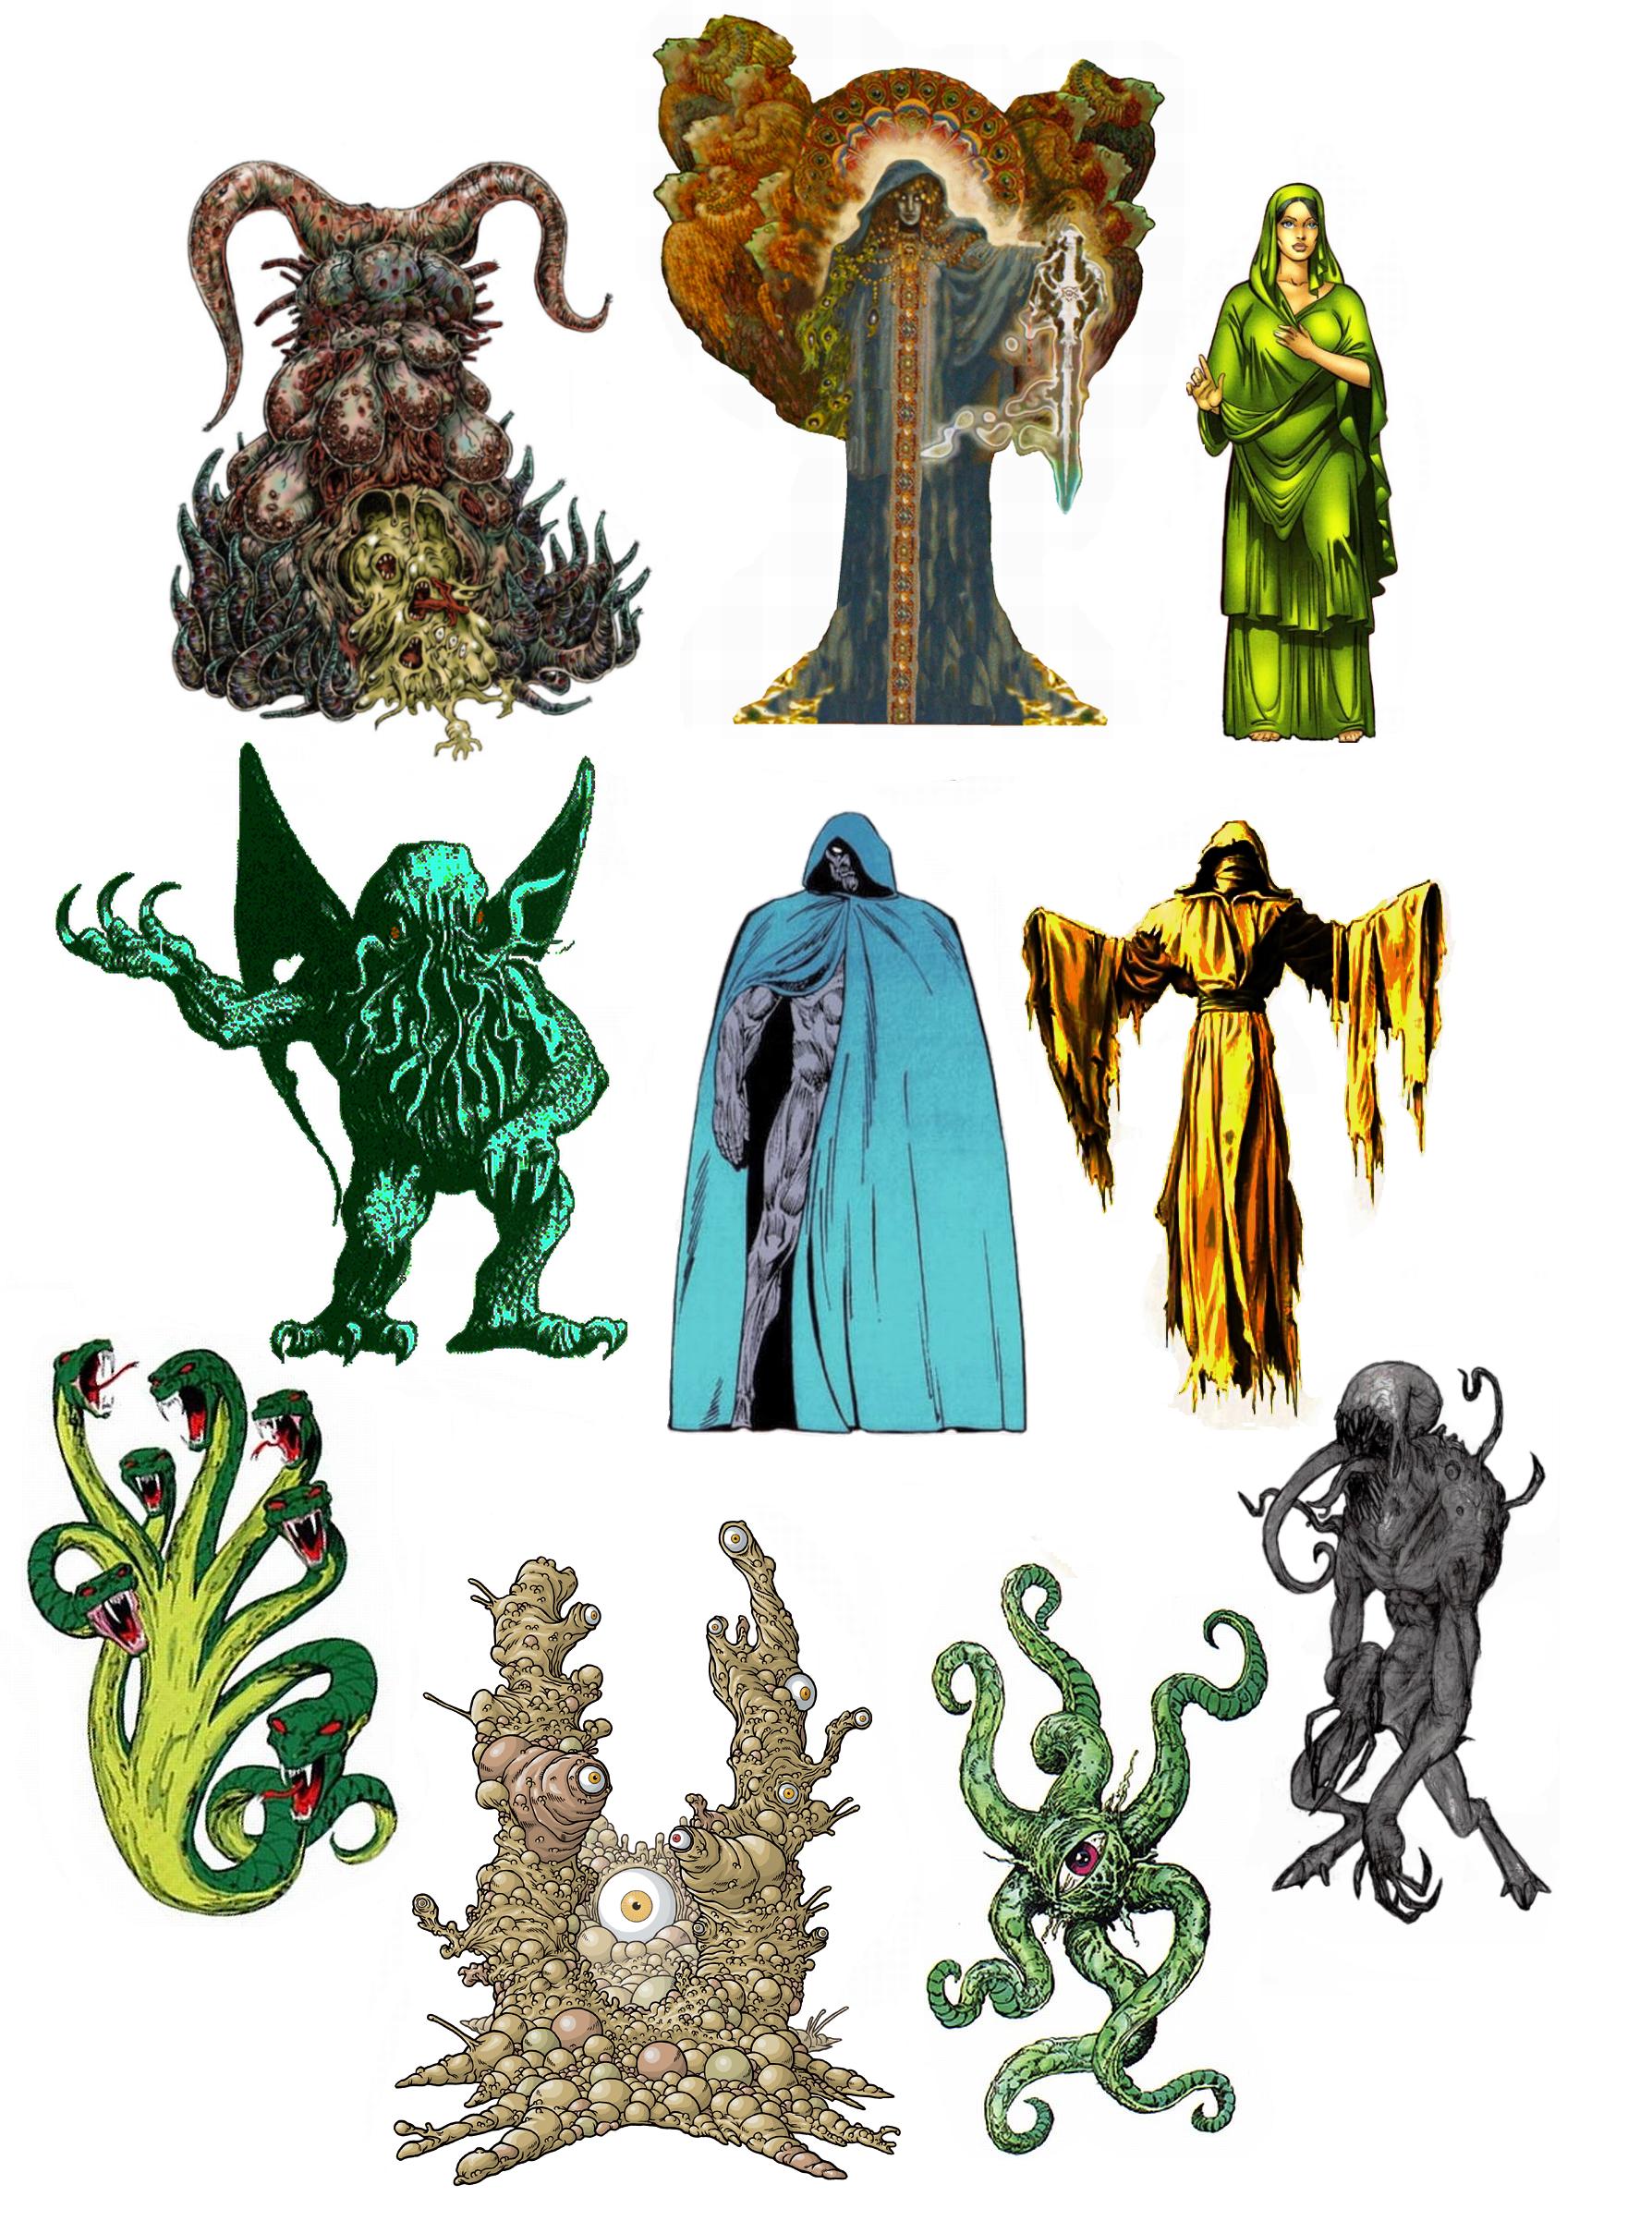 The Celestials vs The Old Gods.